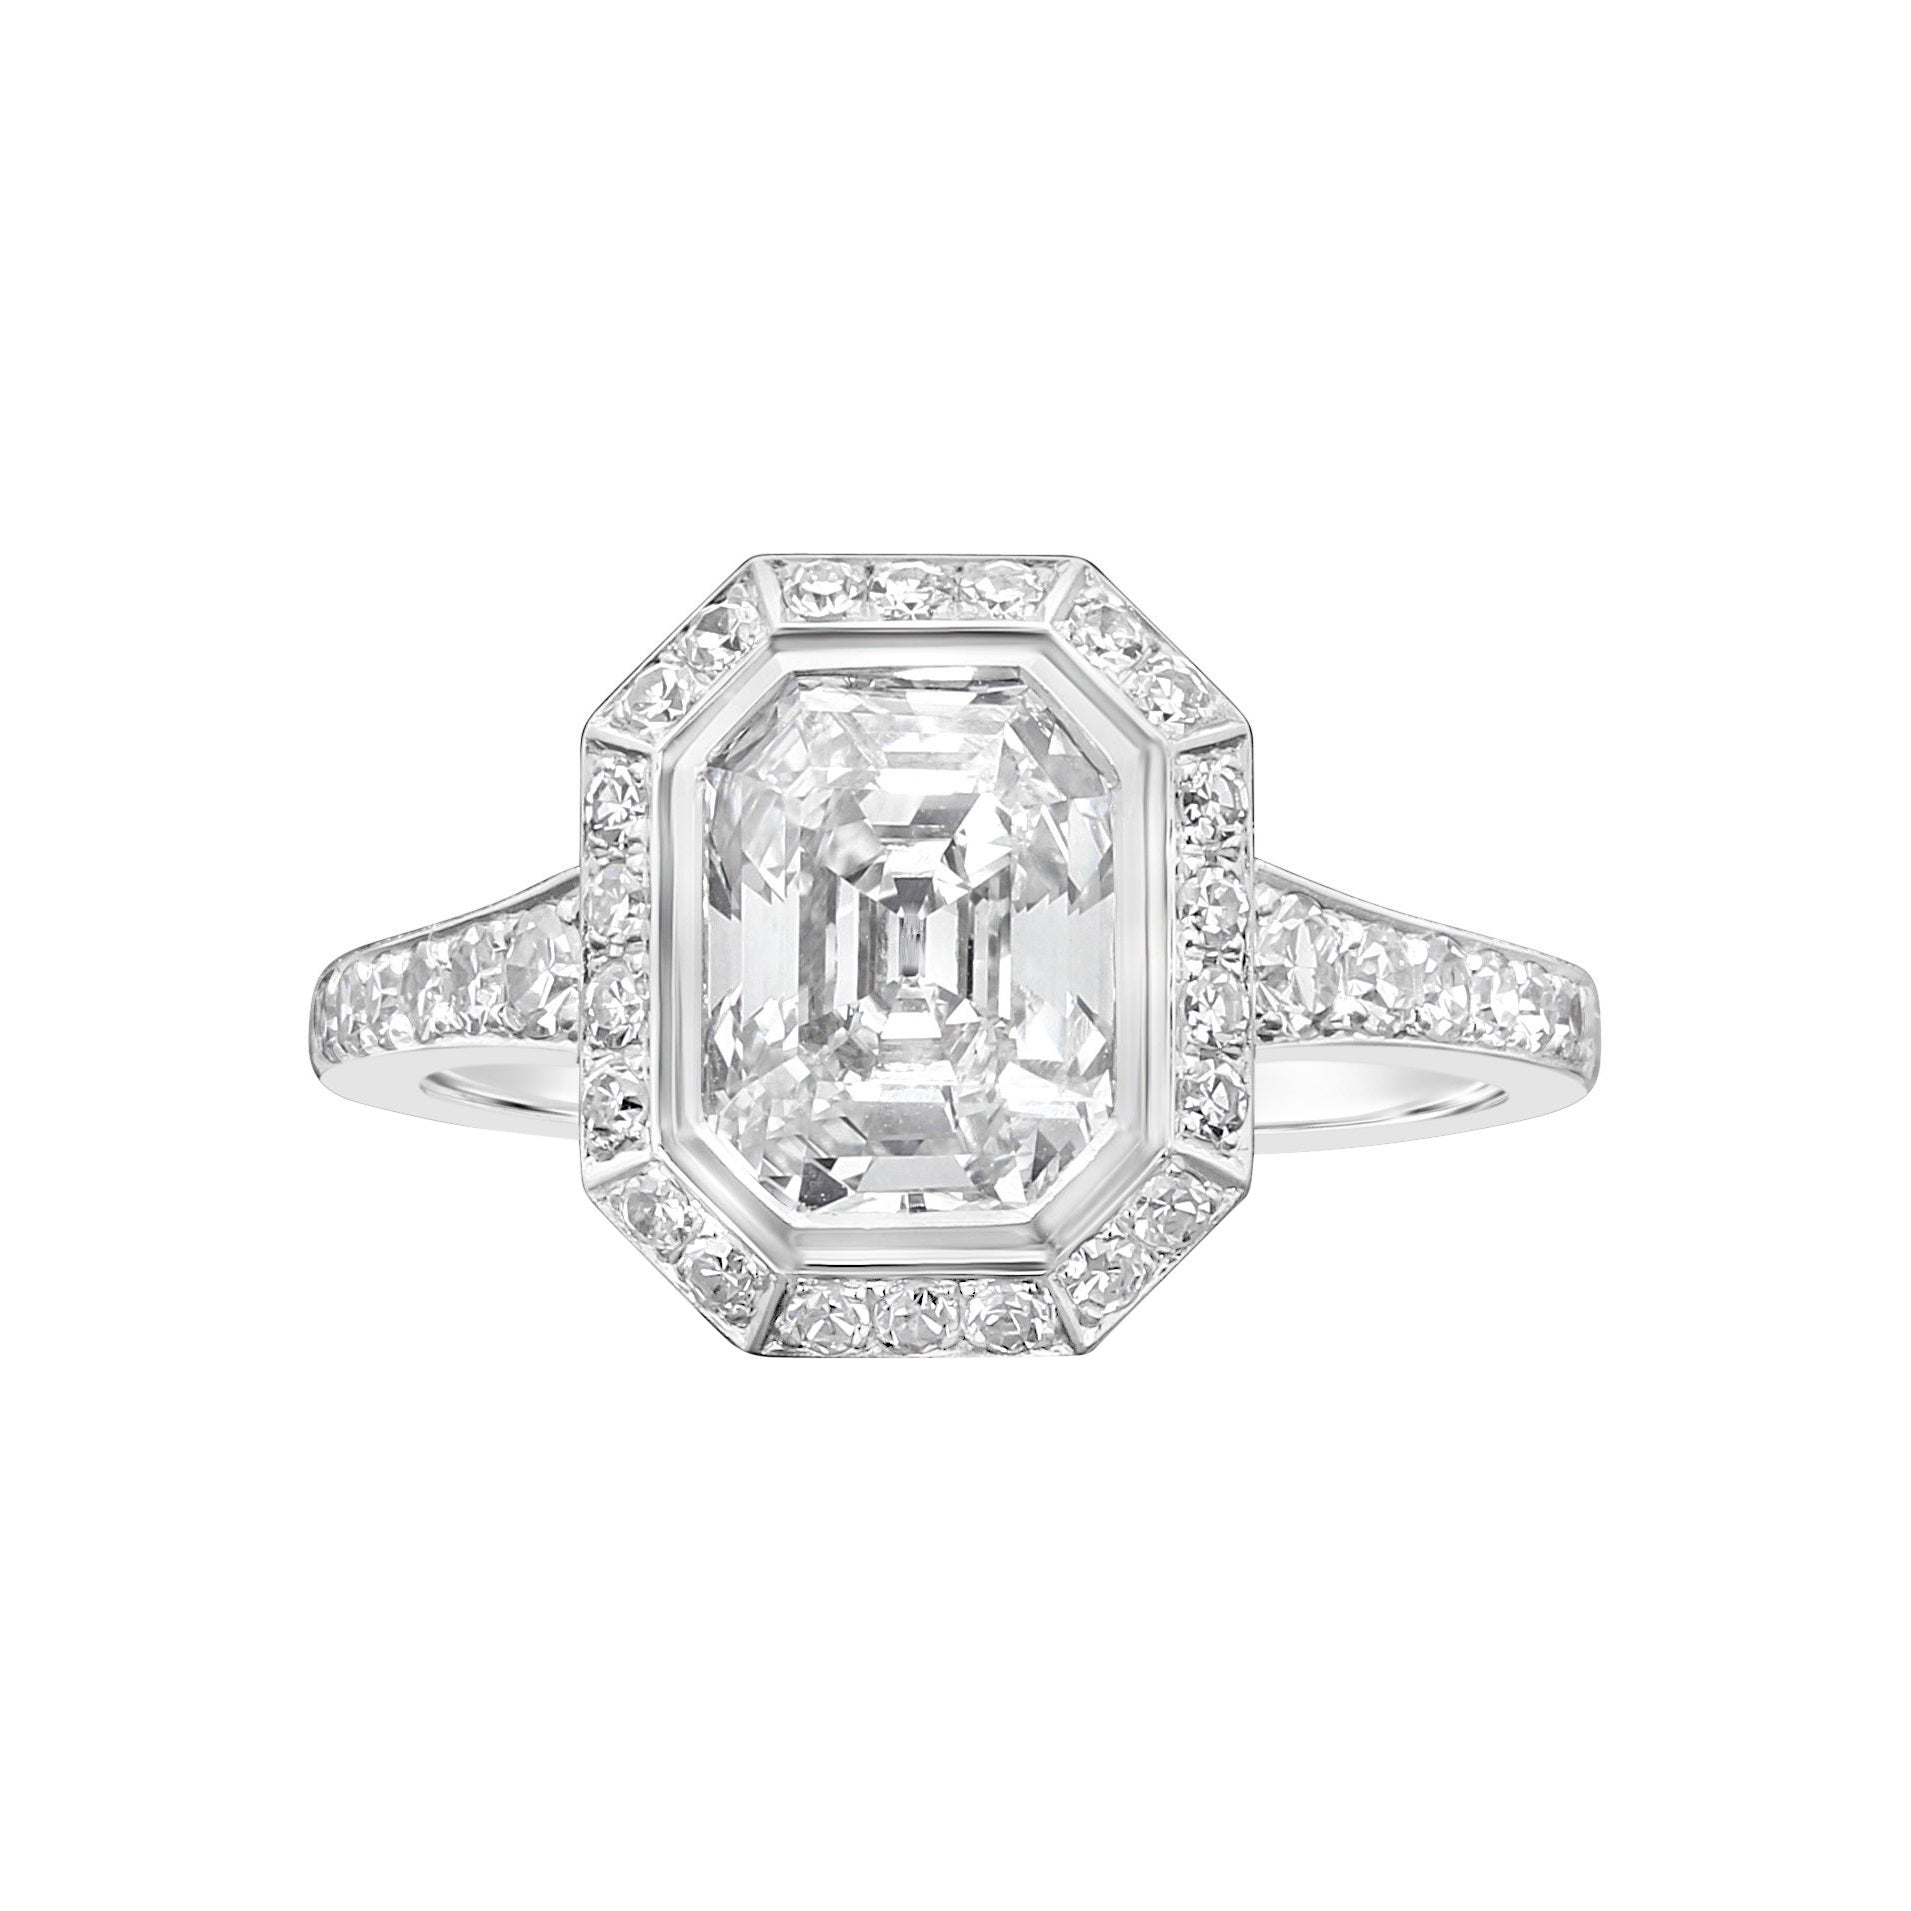 Hancocks 1.82 Carat Emerald-Cut Diamond Ring with a Diamond-Set Halo